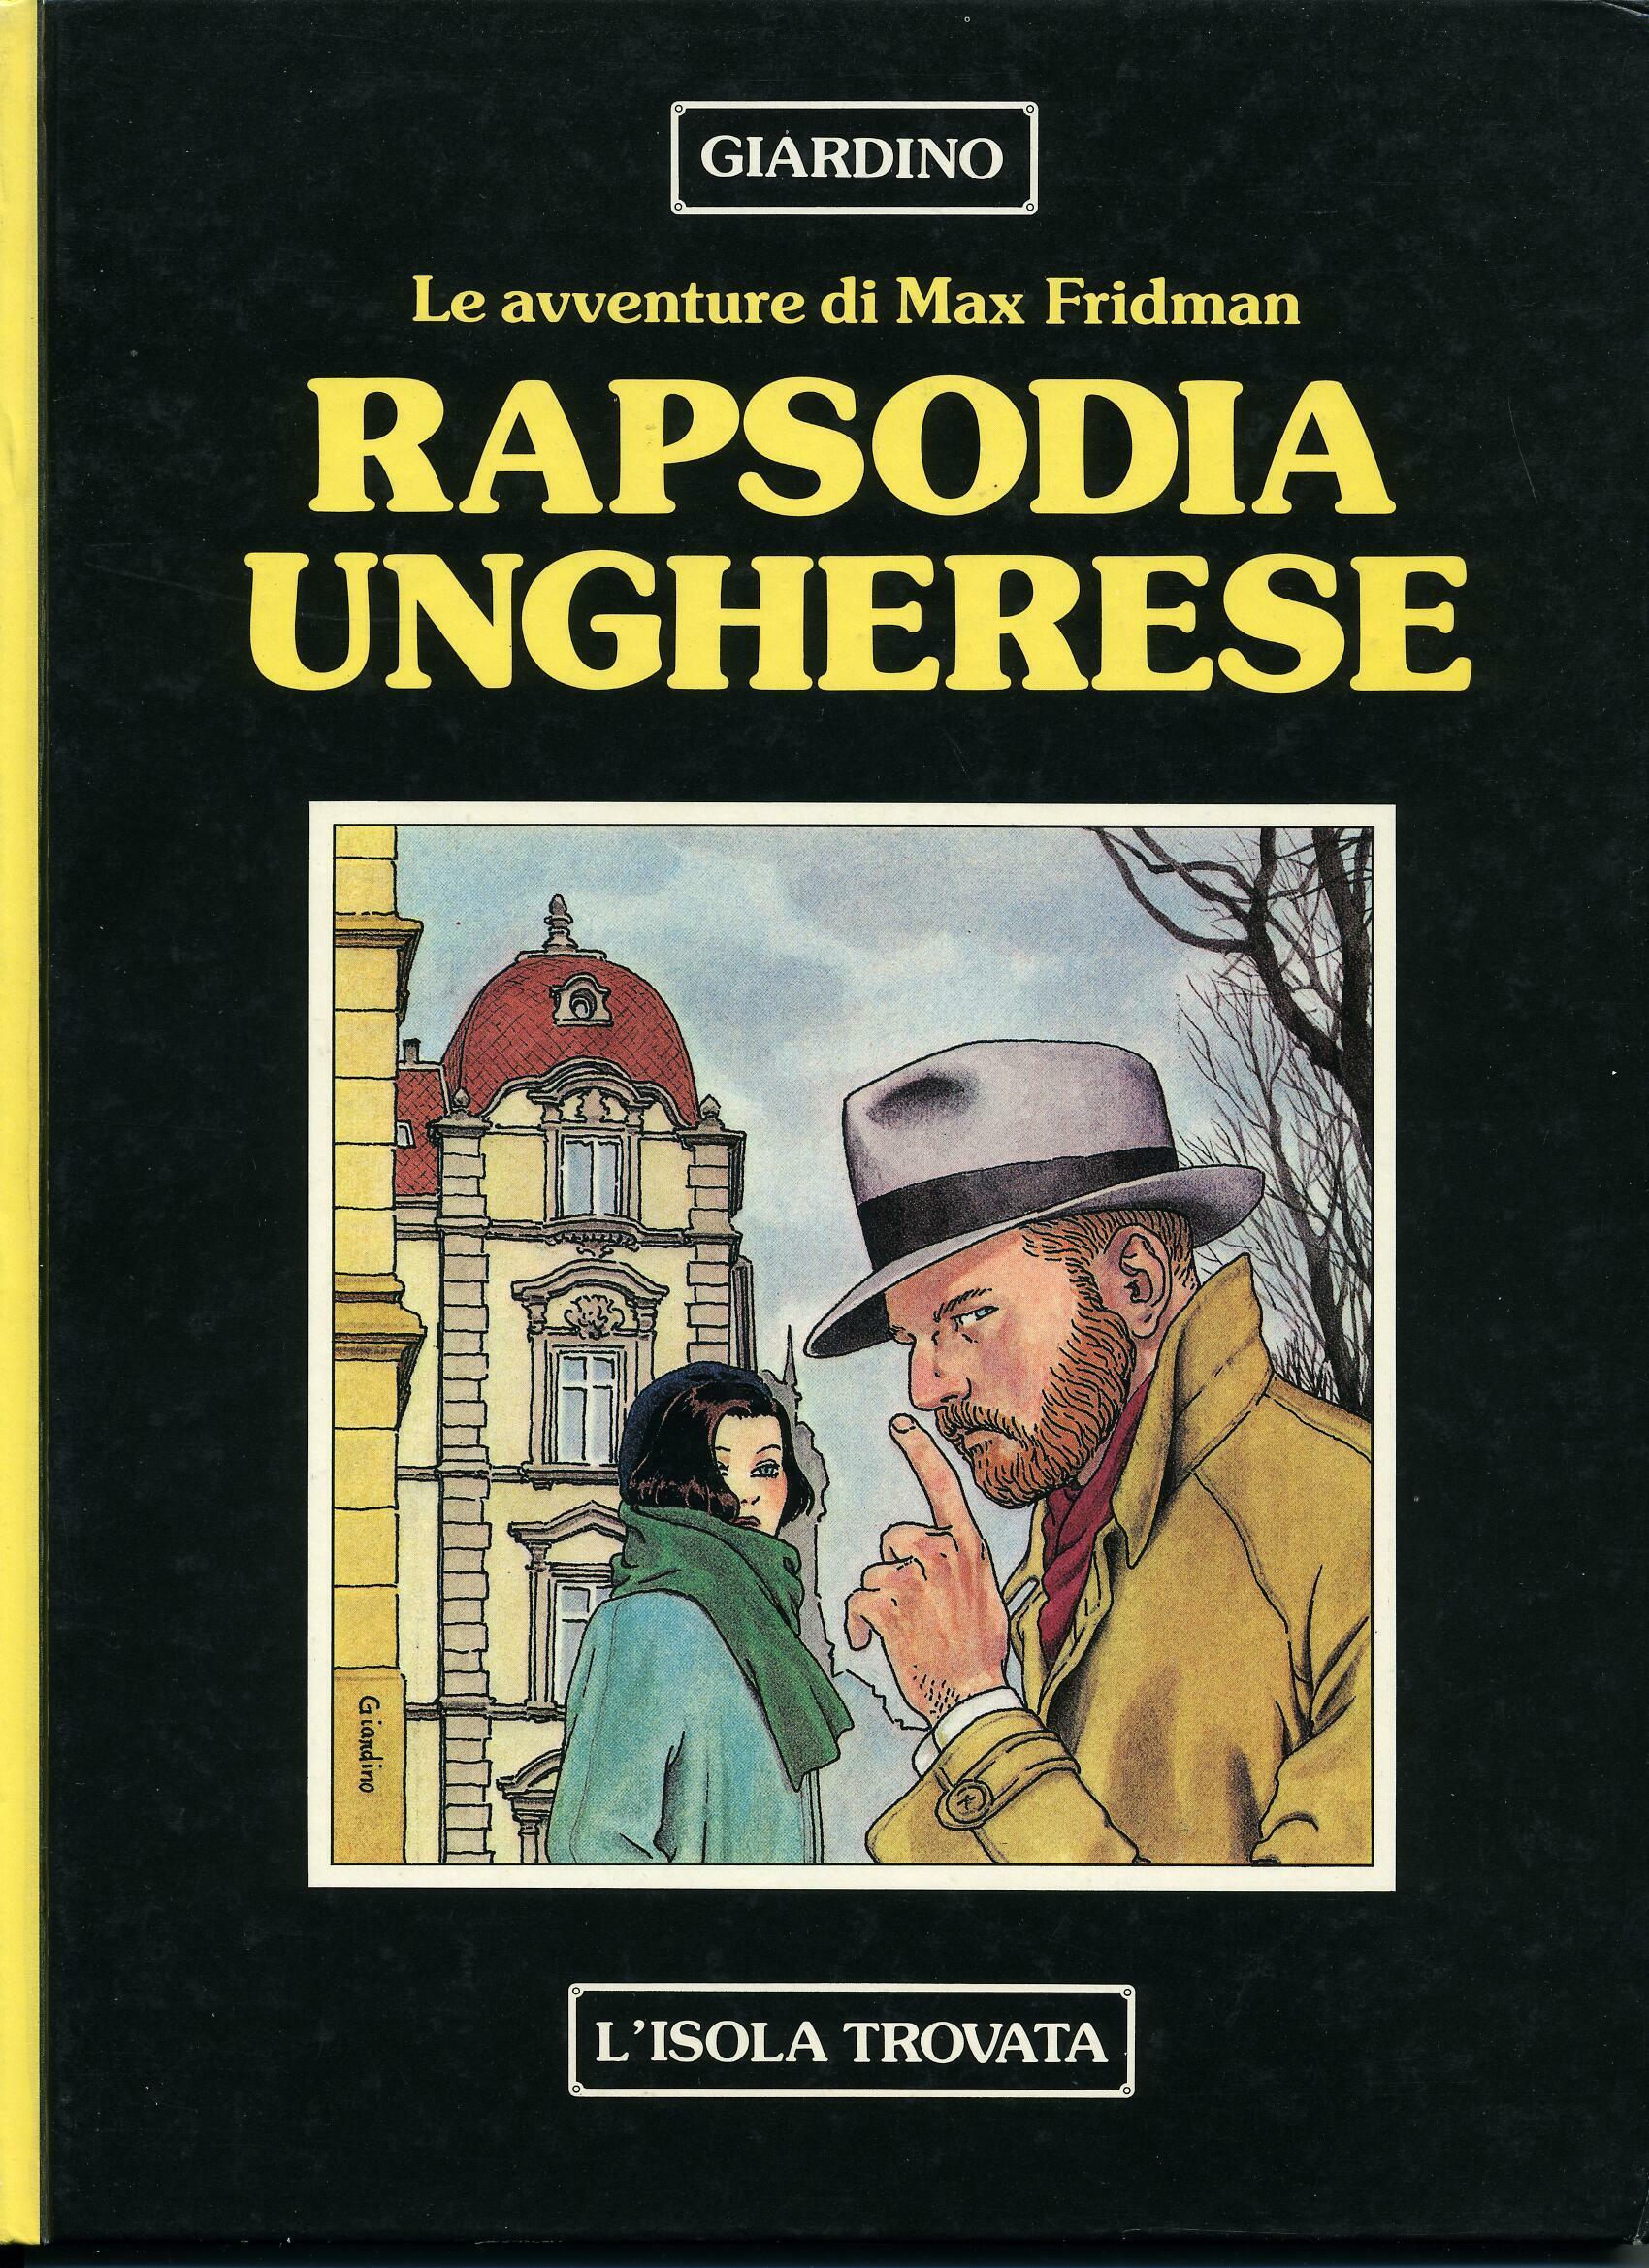 Rapsodia ungherese